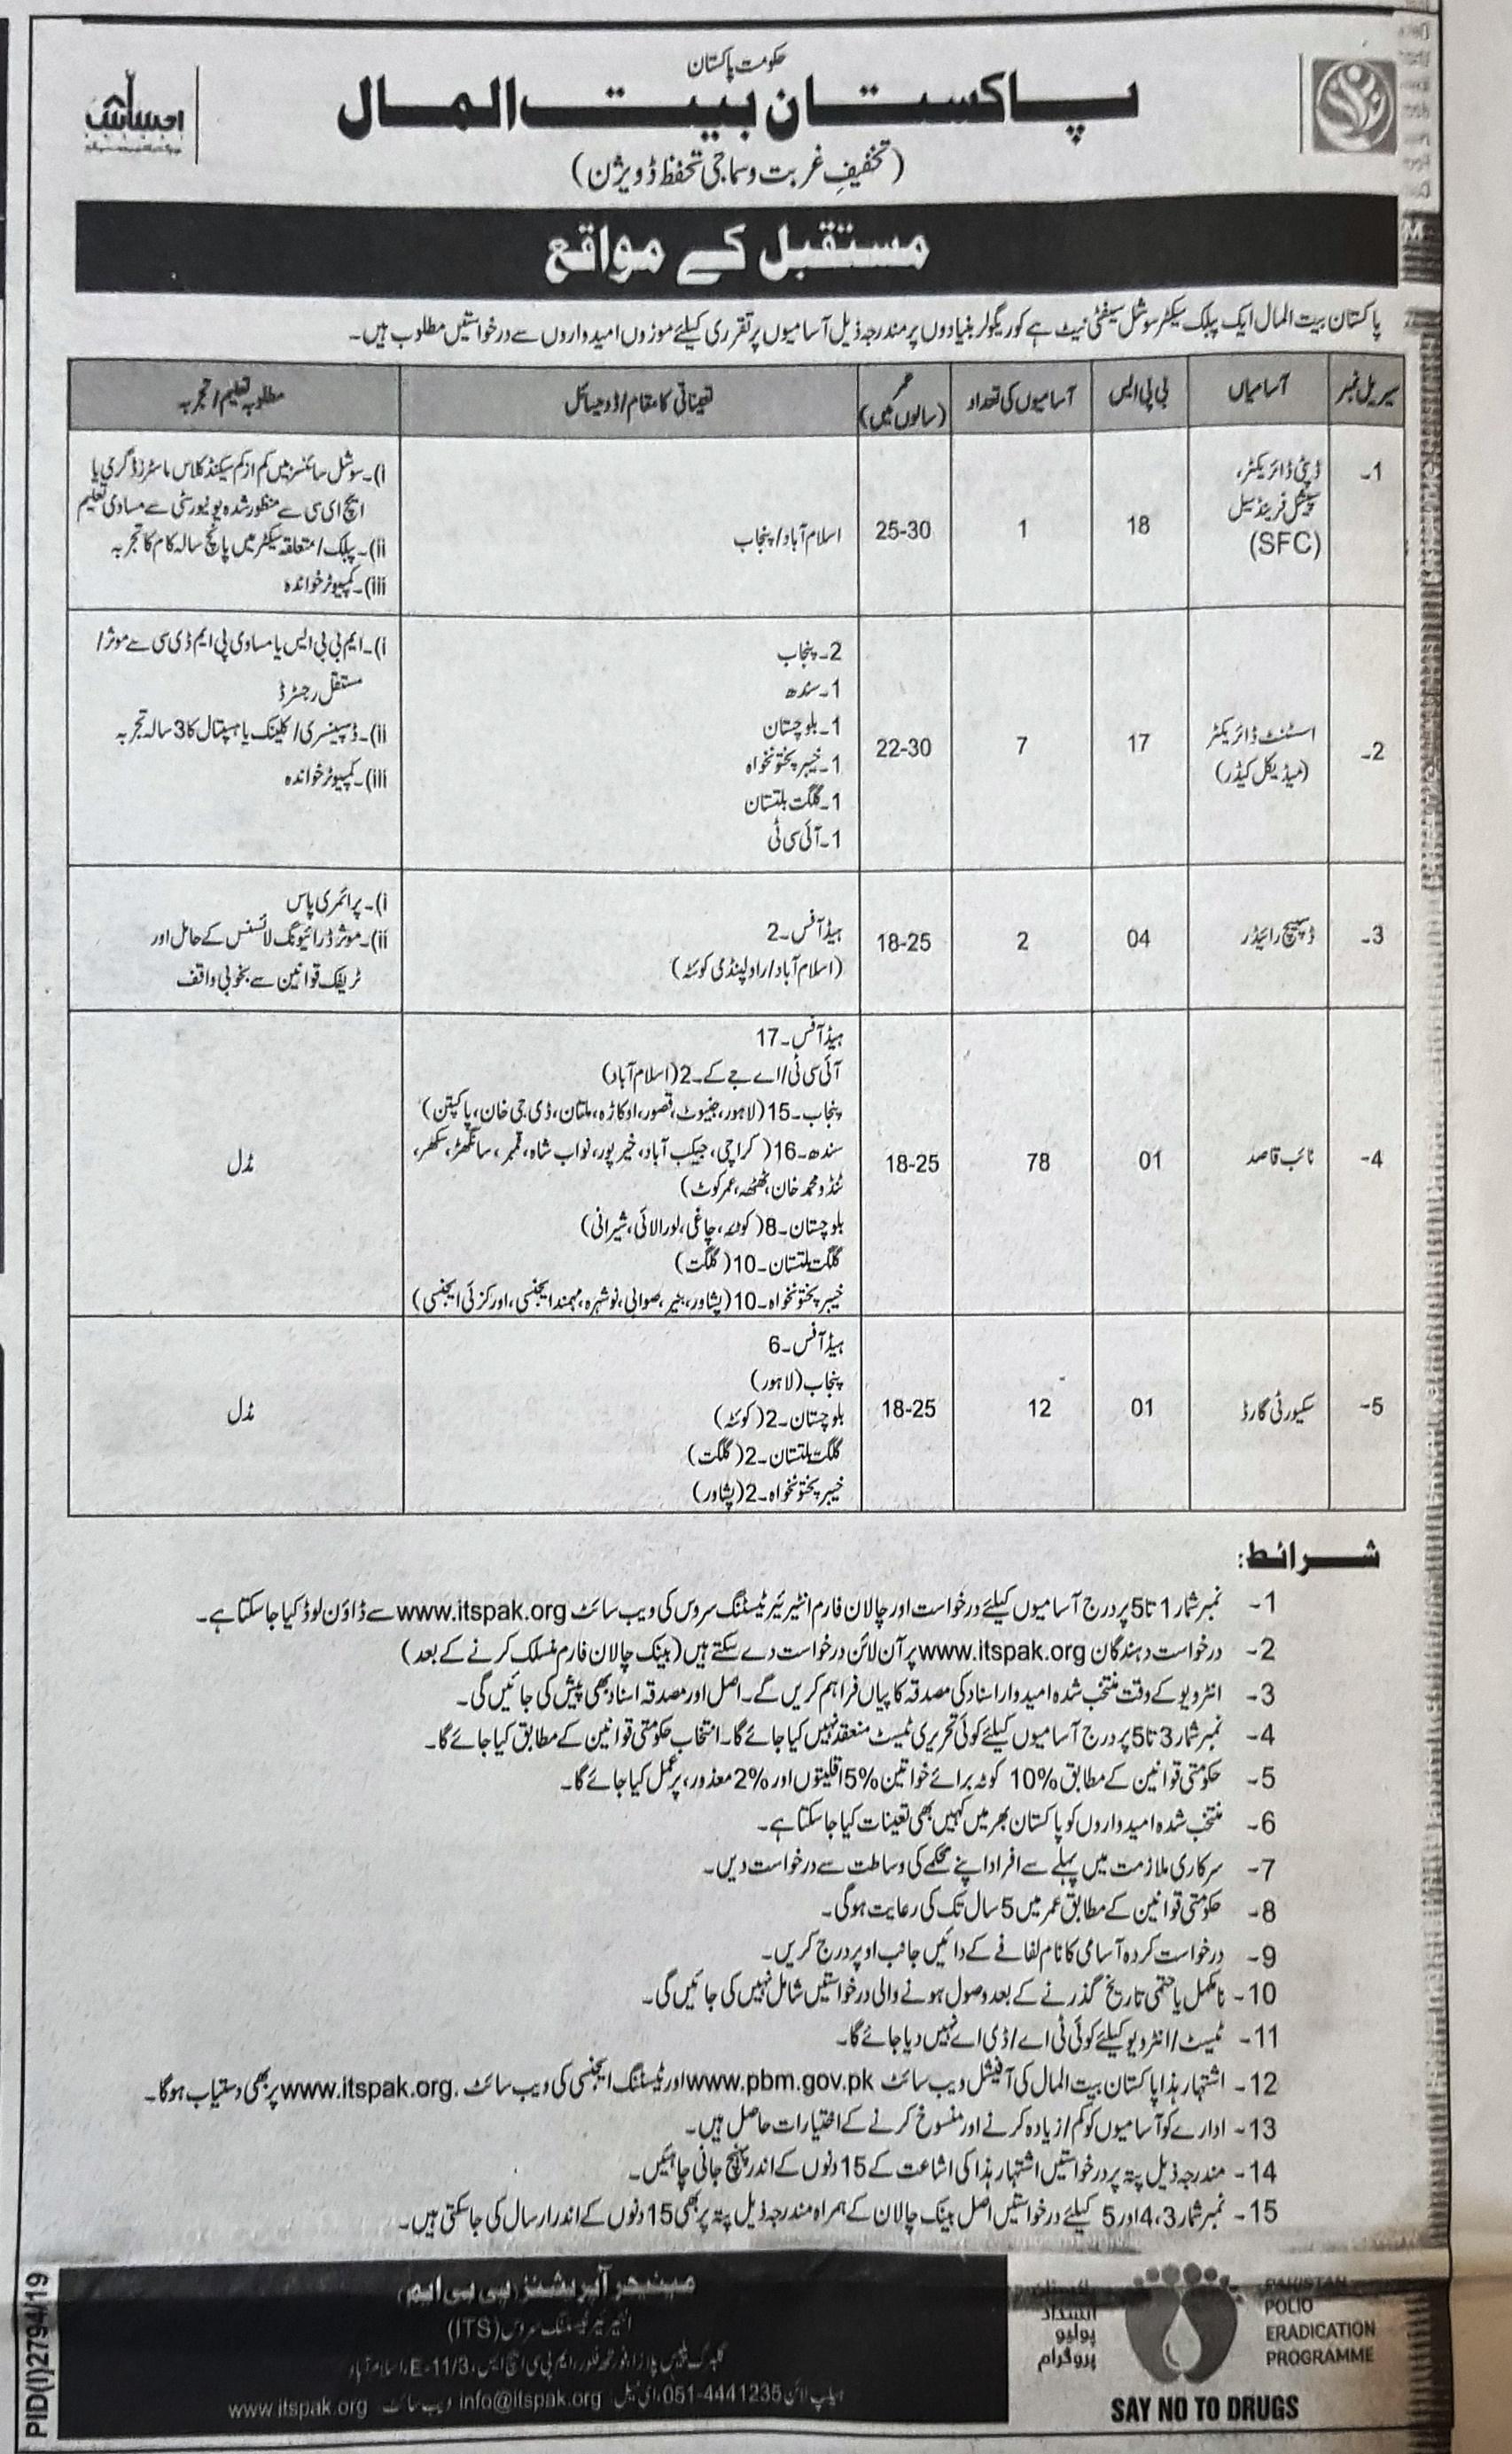 Pakistan Bait ul Mal Jobs 2019 ITS Application Form Roll No Slip download online